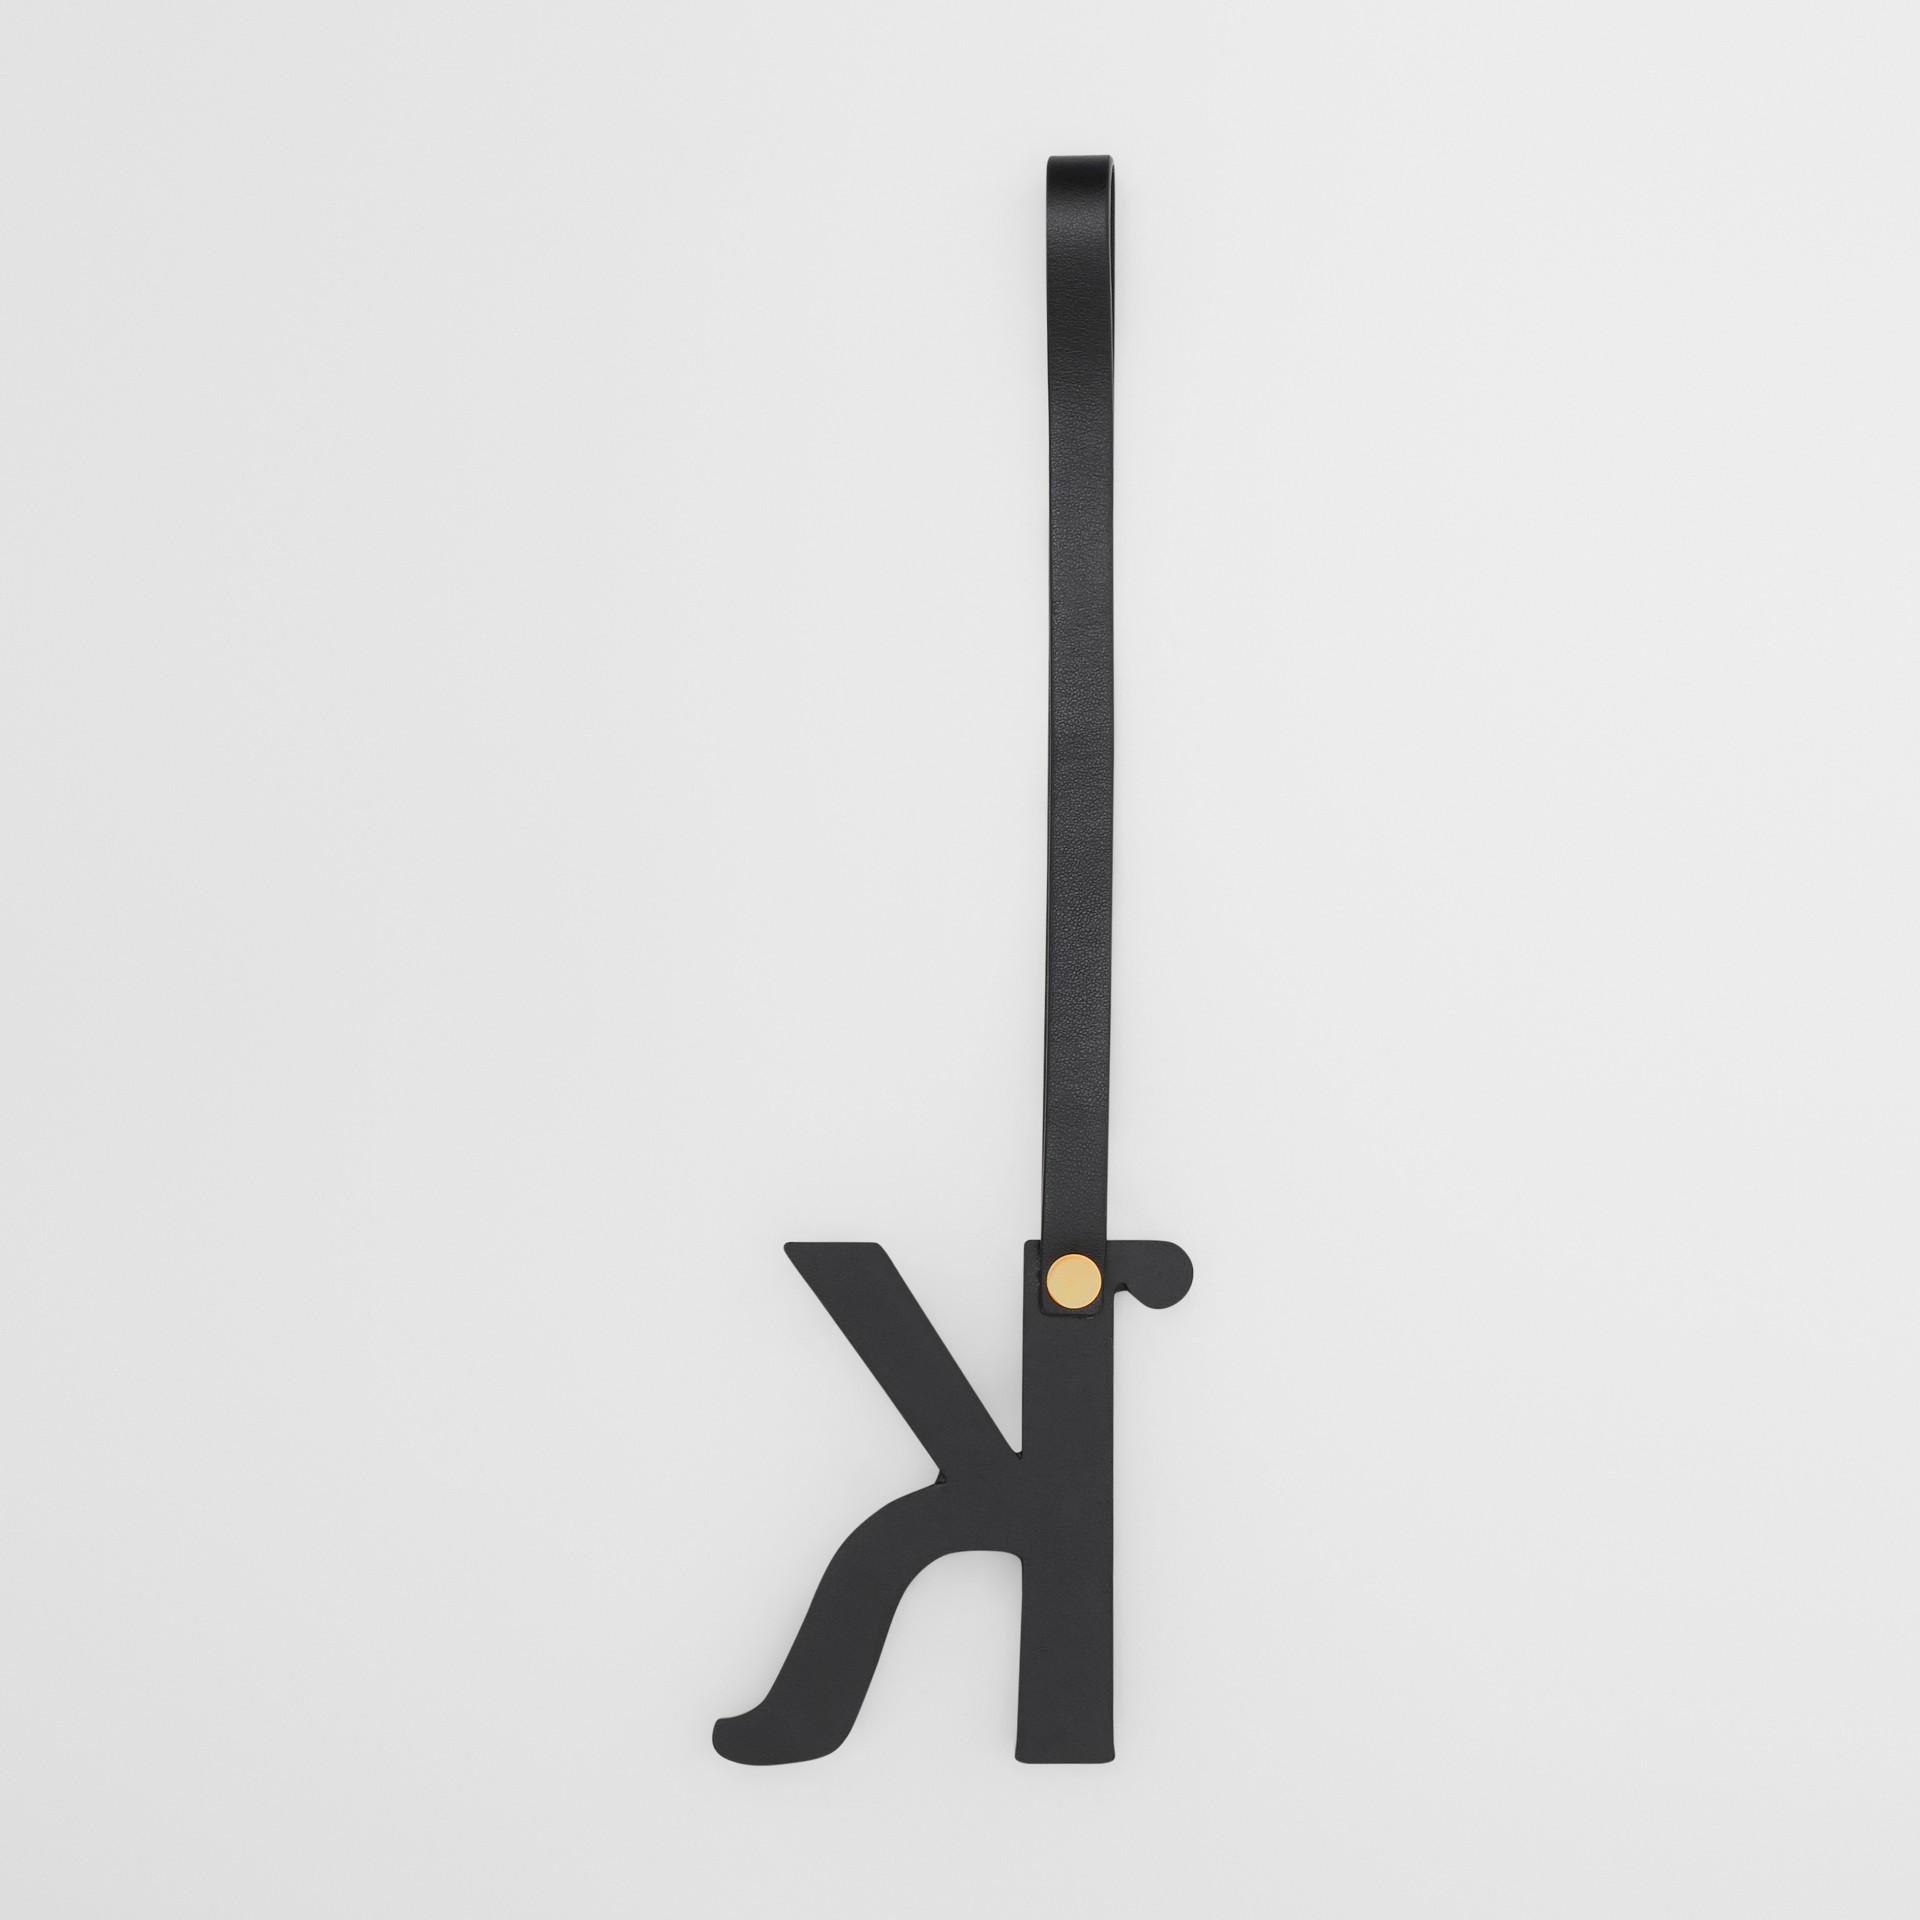 「K」スタッズレザー アルファベットチャーム (ブラック/ライトゴールド) | バーバリー - ギャラリーイメージ 2